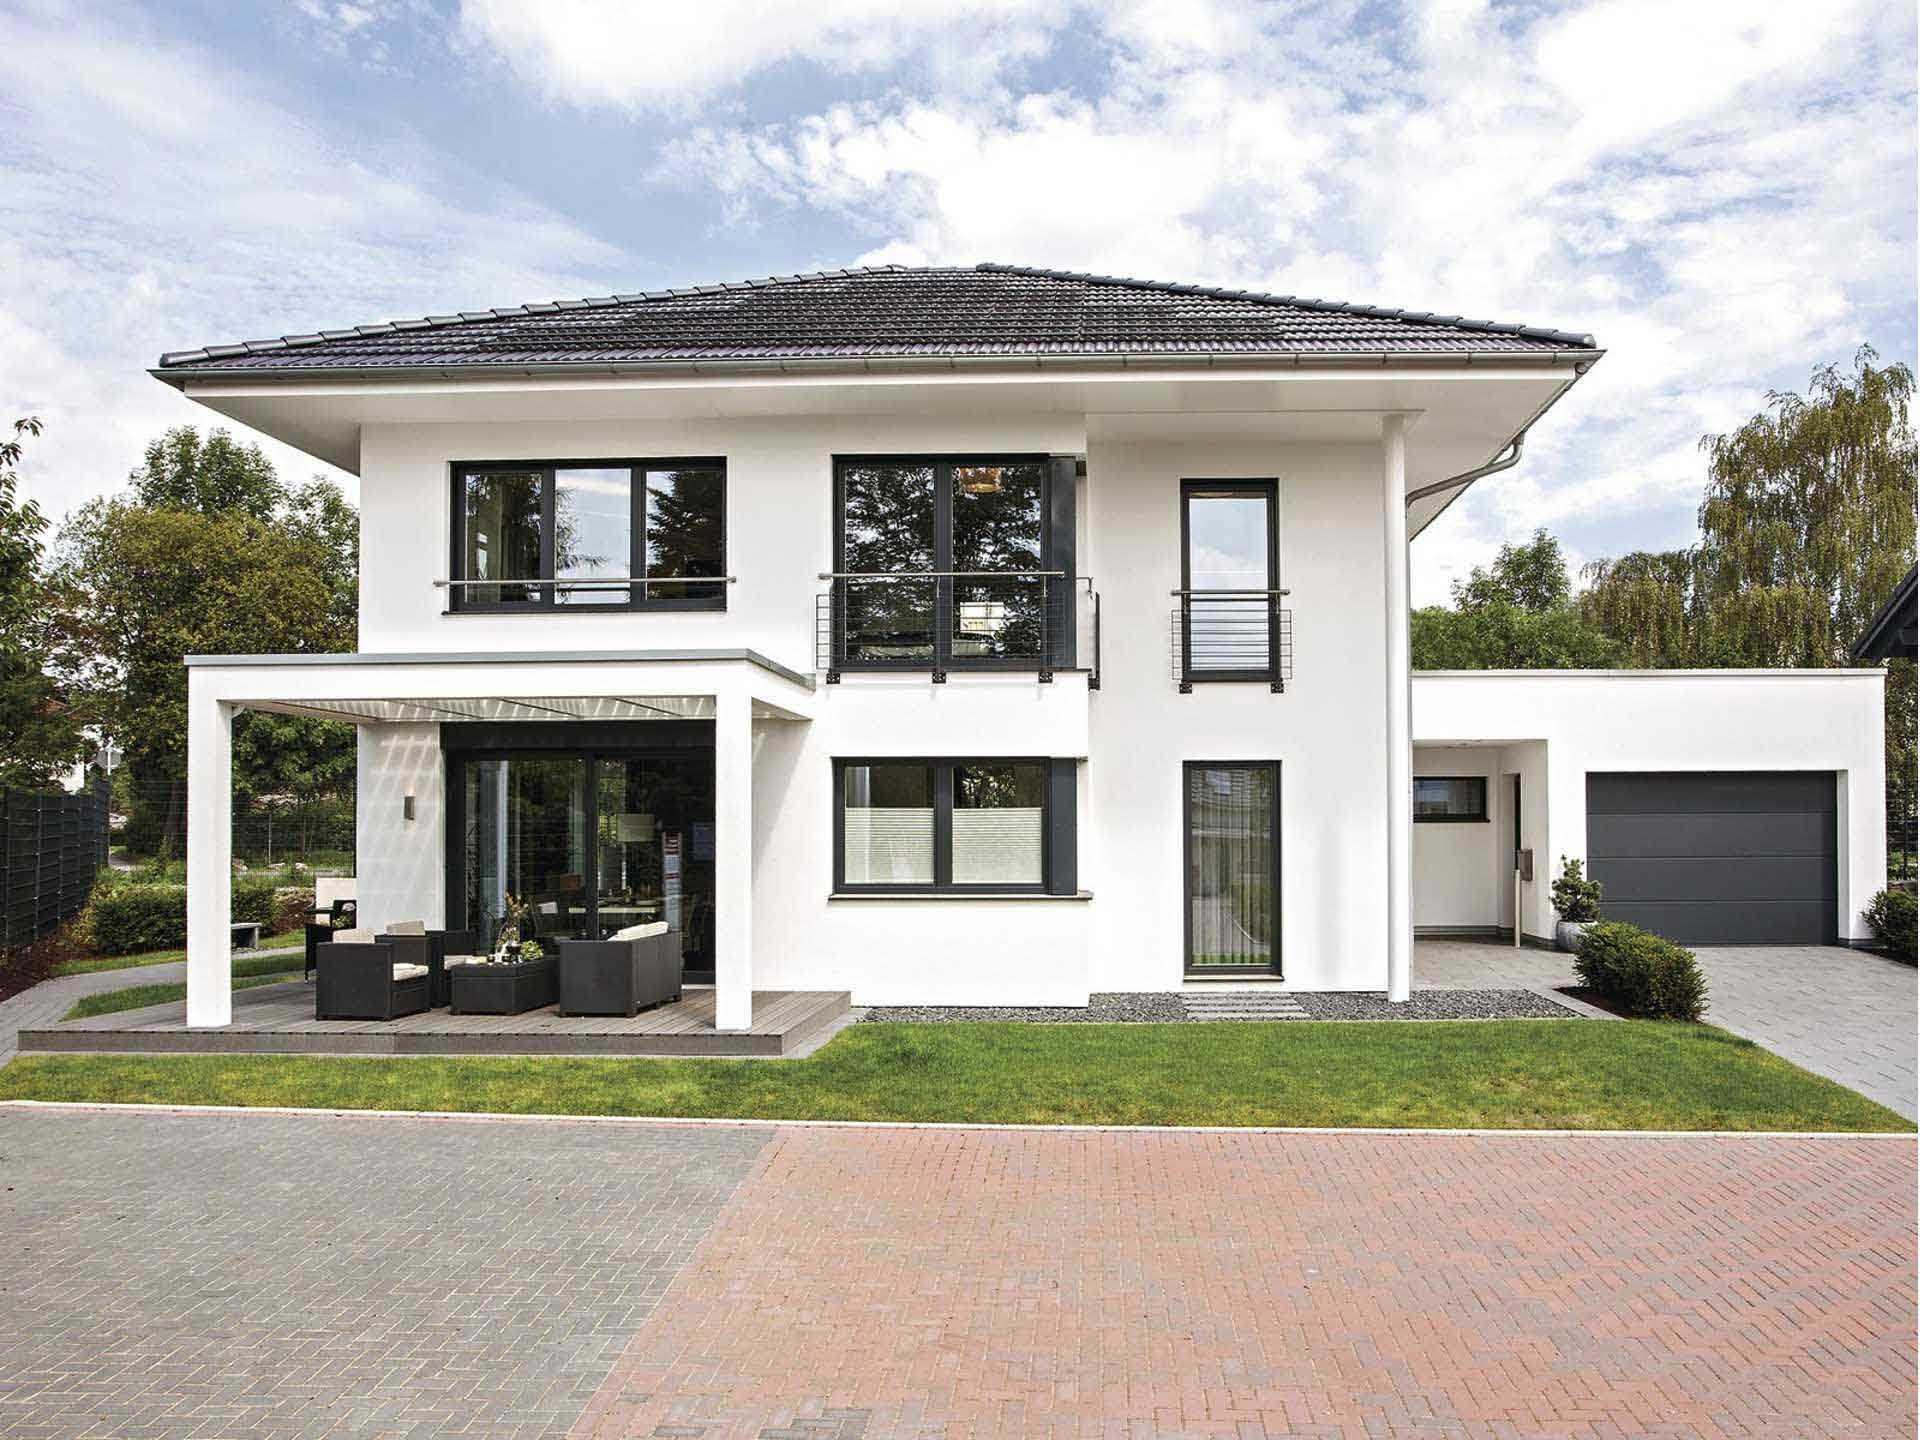 Musterhaus citylife 250 weberhaus for Walmdach modern